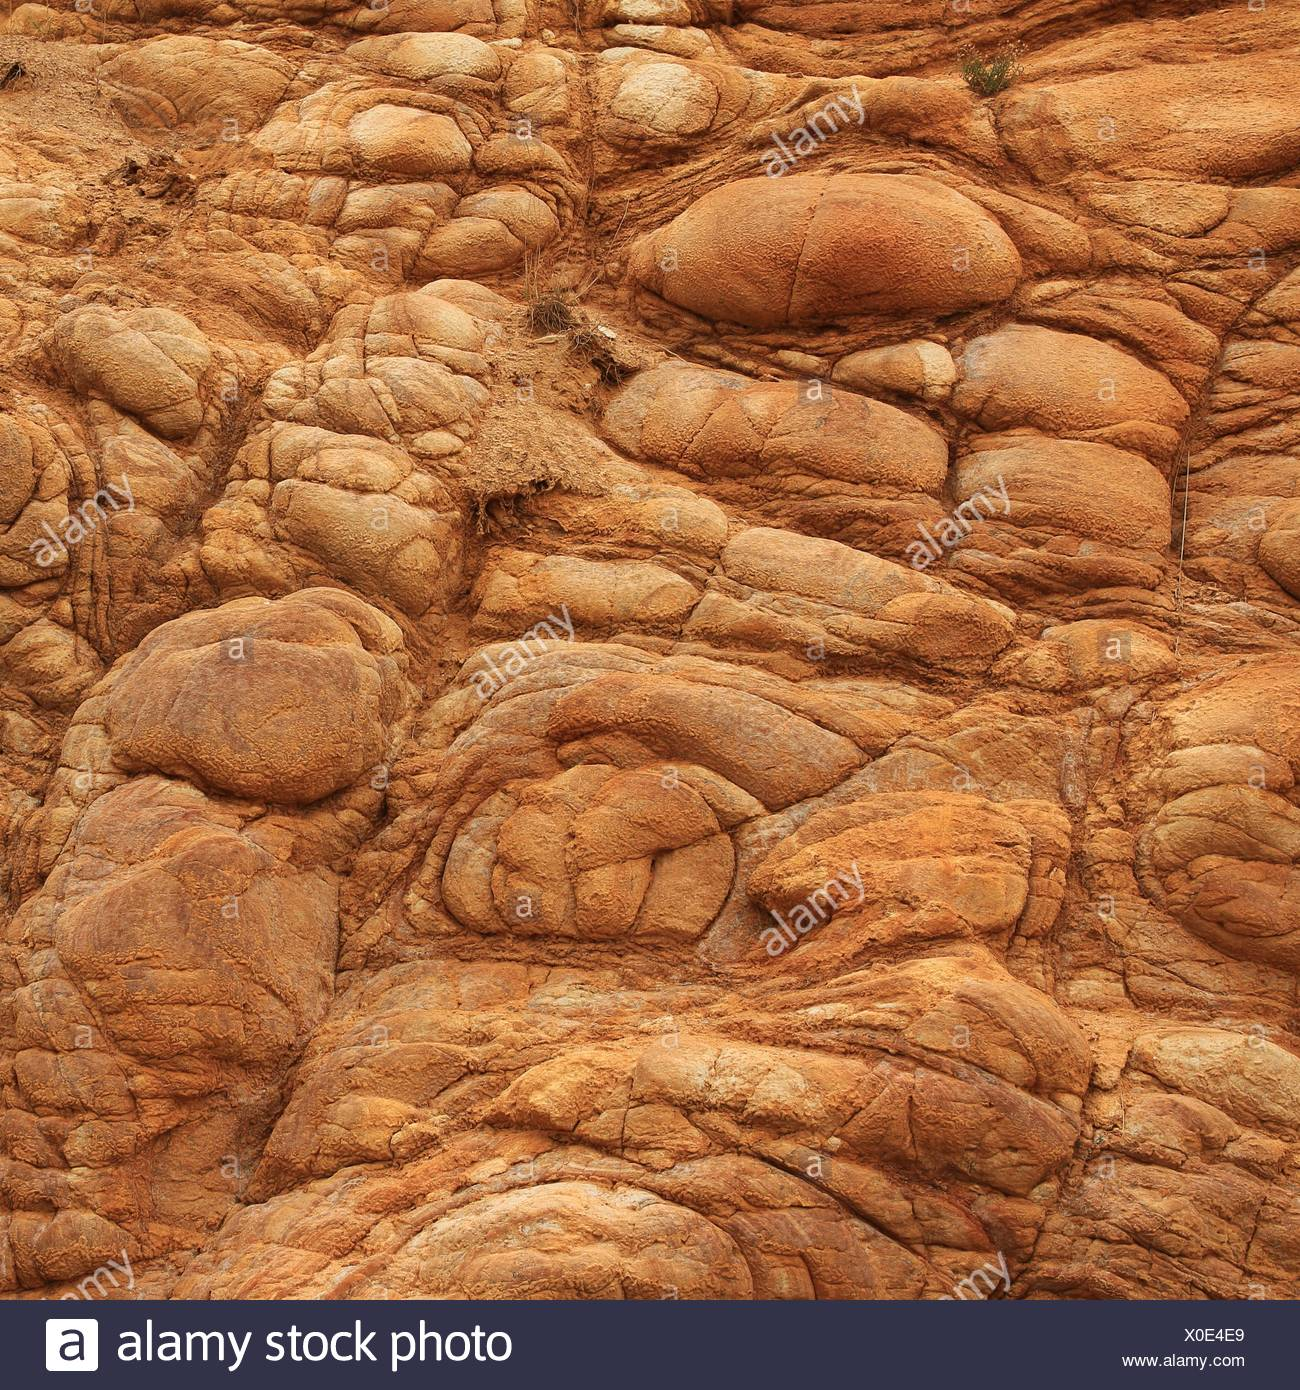 Bubbles in vulcanic rock - Stock Image